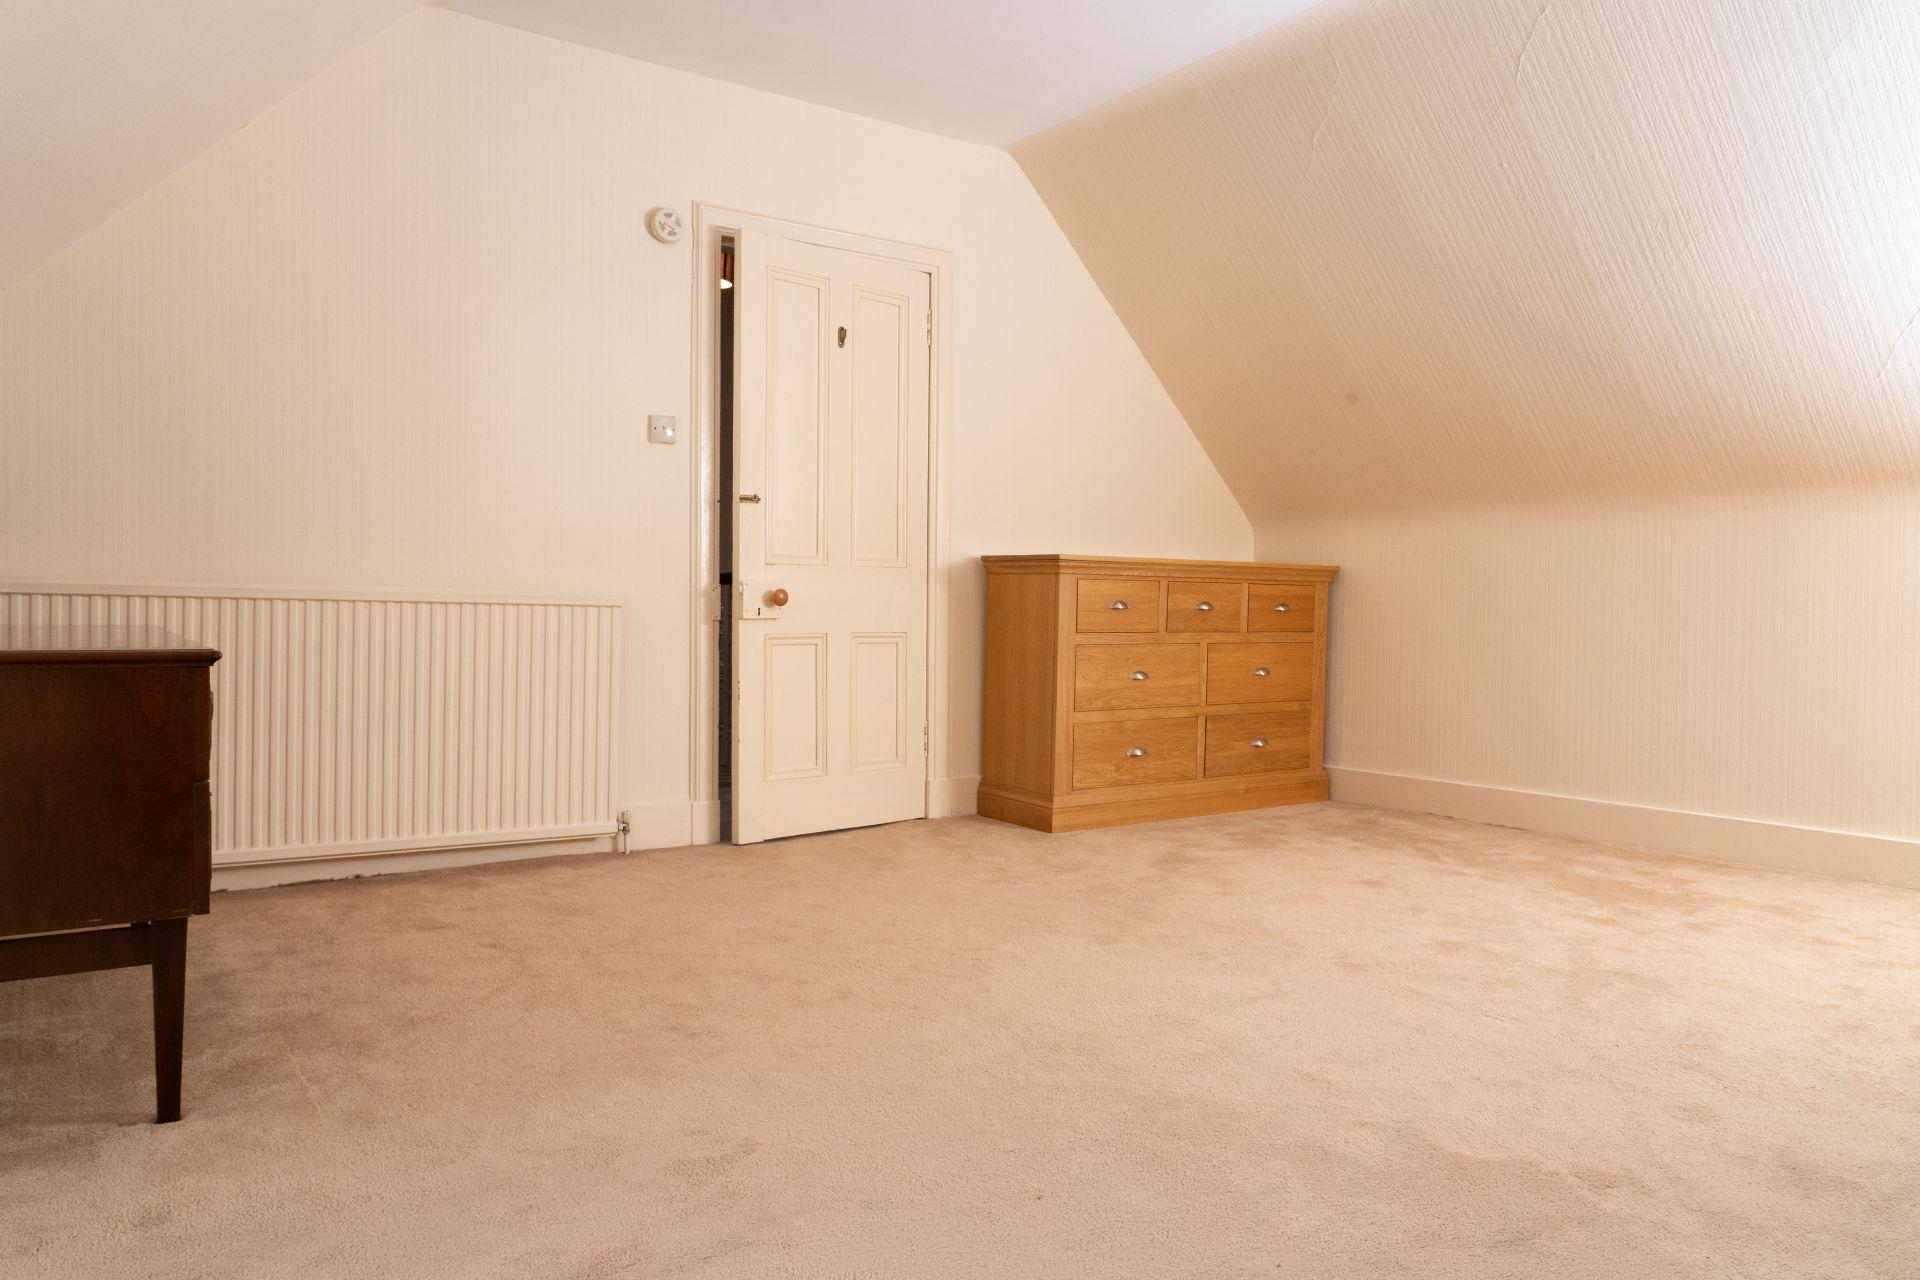 ARD-Properties-Development-Sites-Buy-Homes-Rent-Aberdeenshire-Rentals-2a-St-Andrew-Streeet-Peterhead-Banner (23)